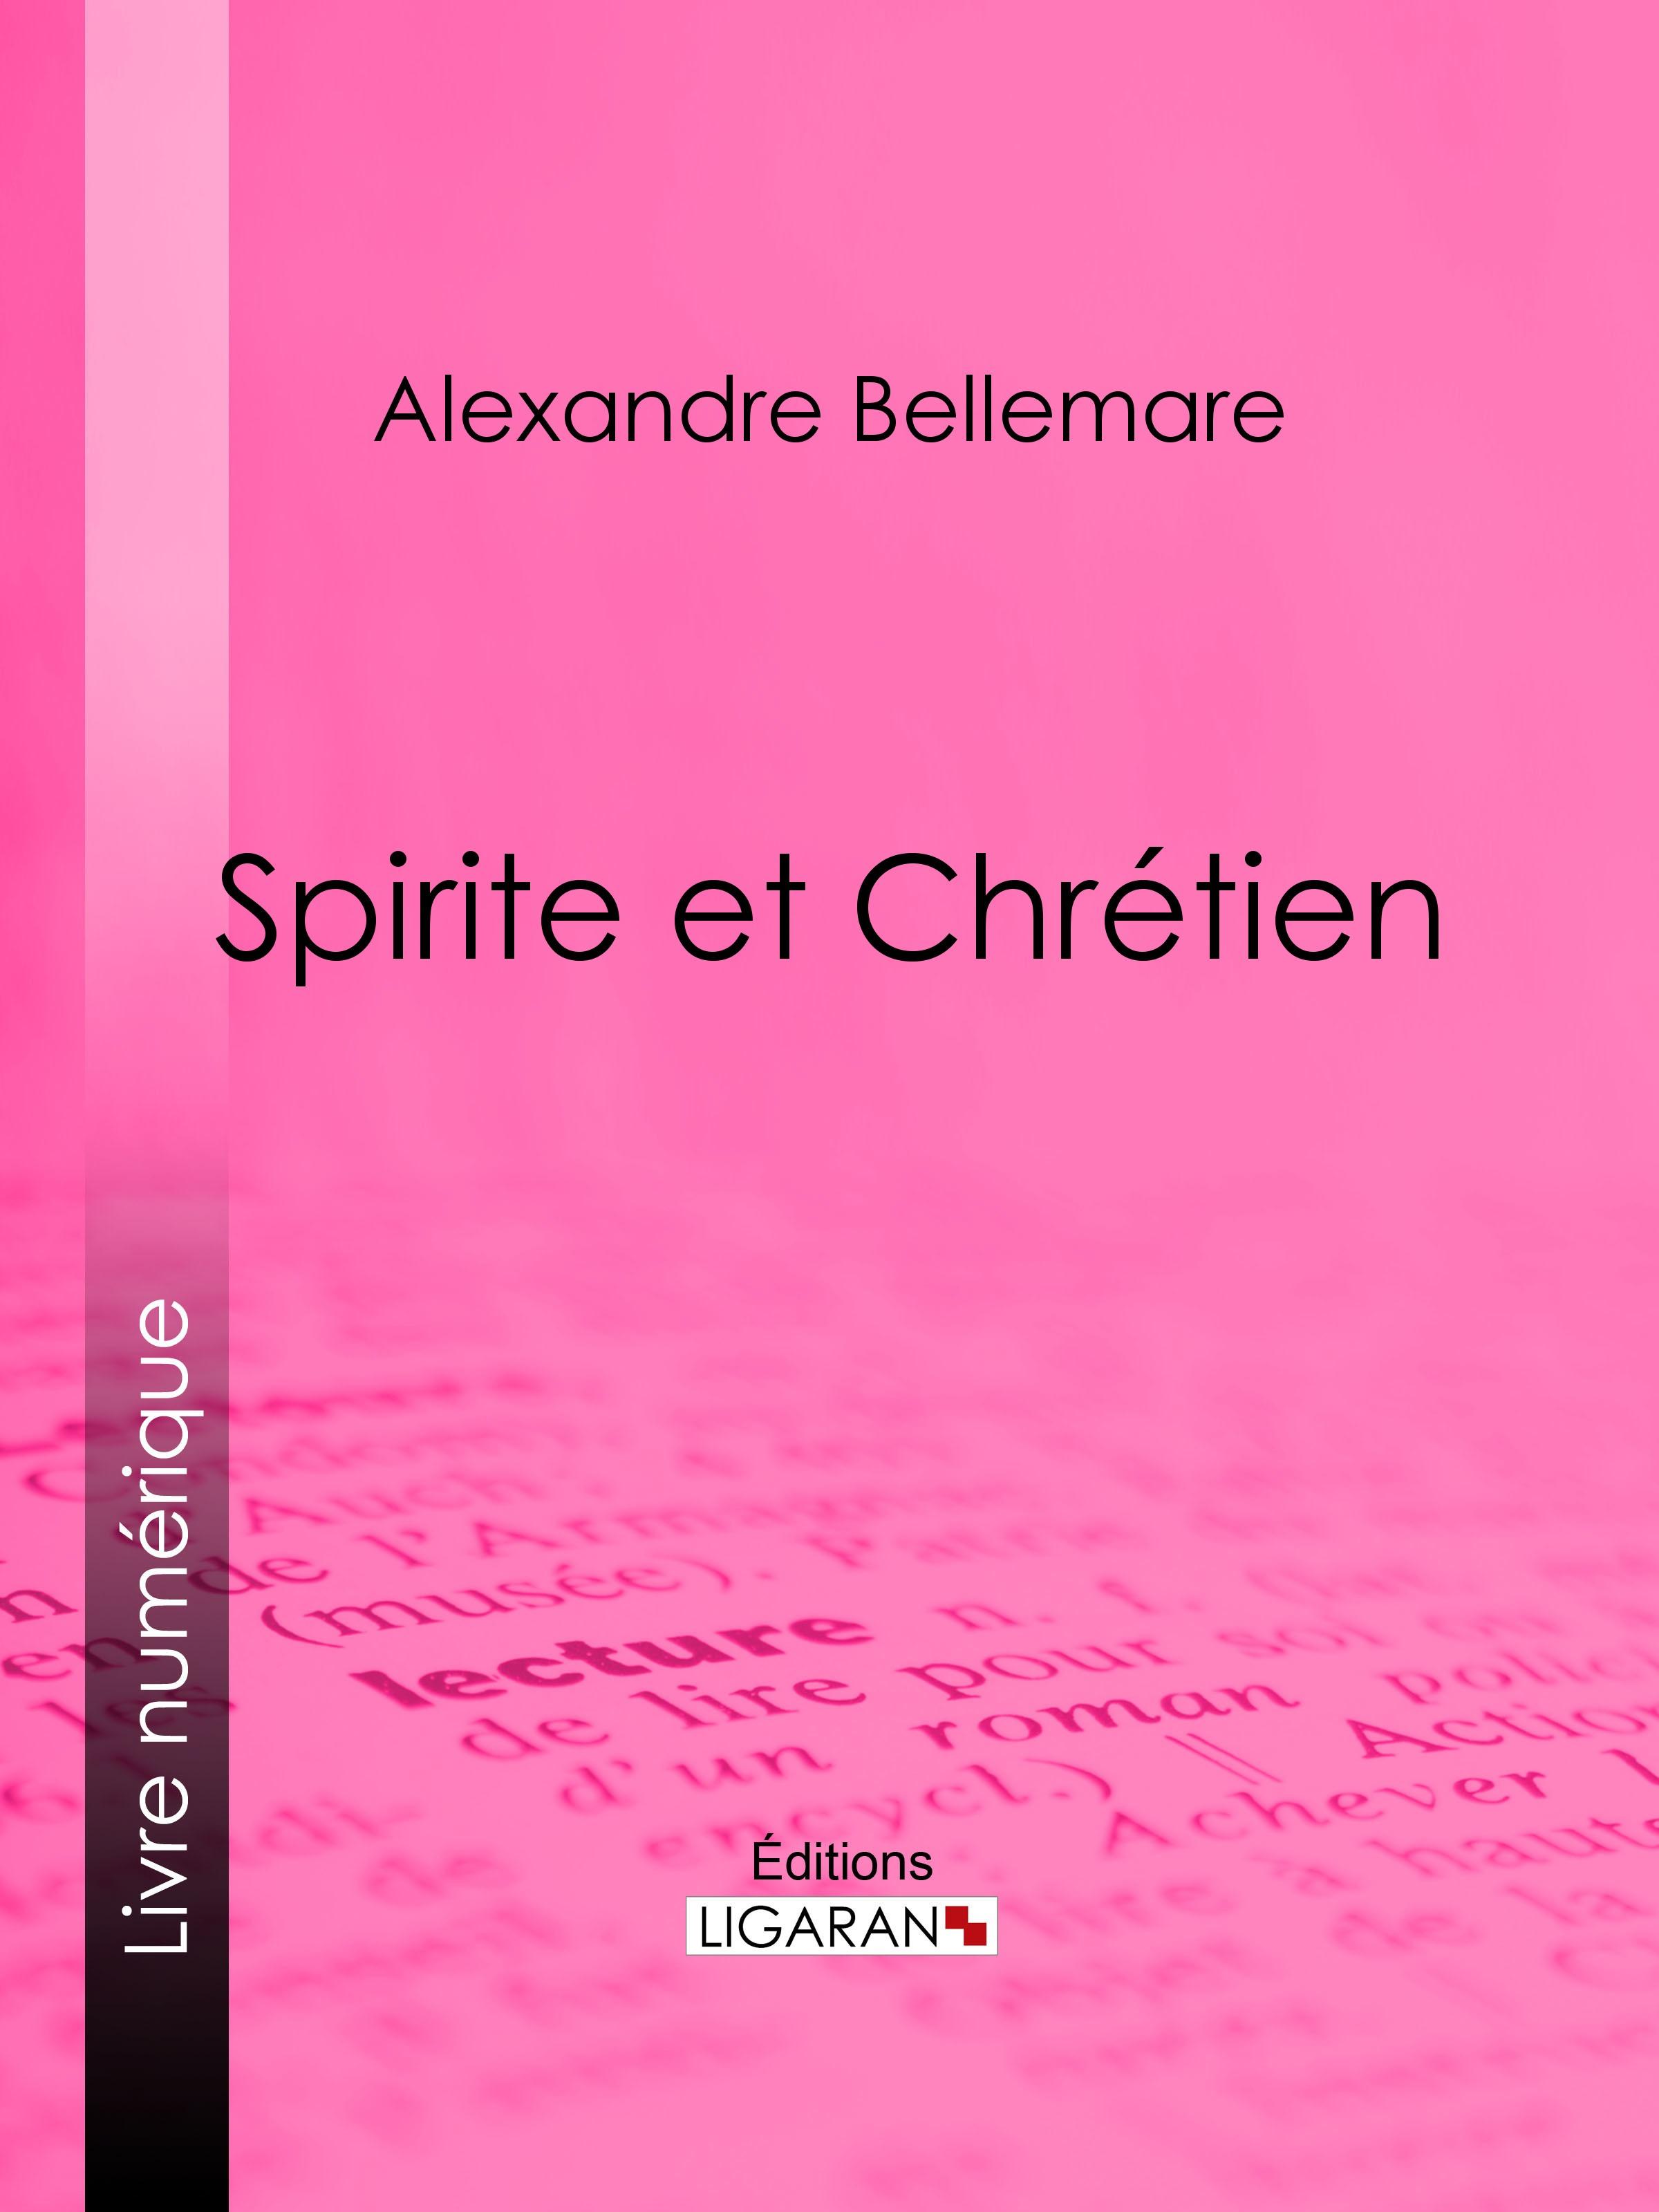 Spirite et Chrétien